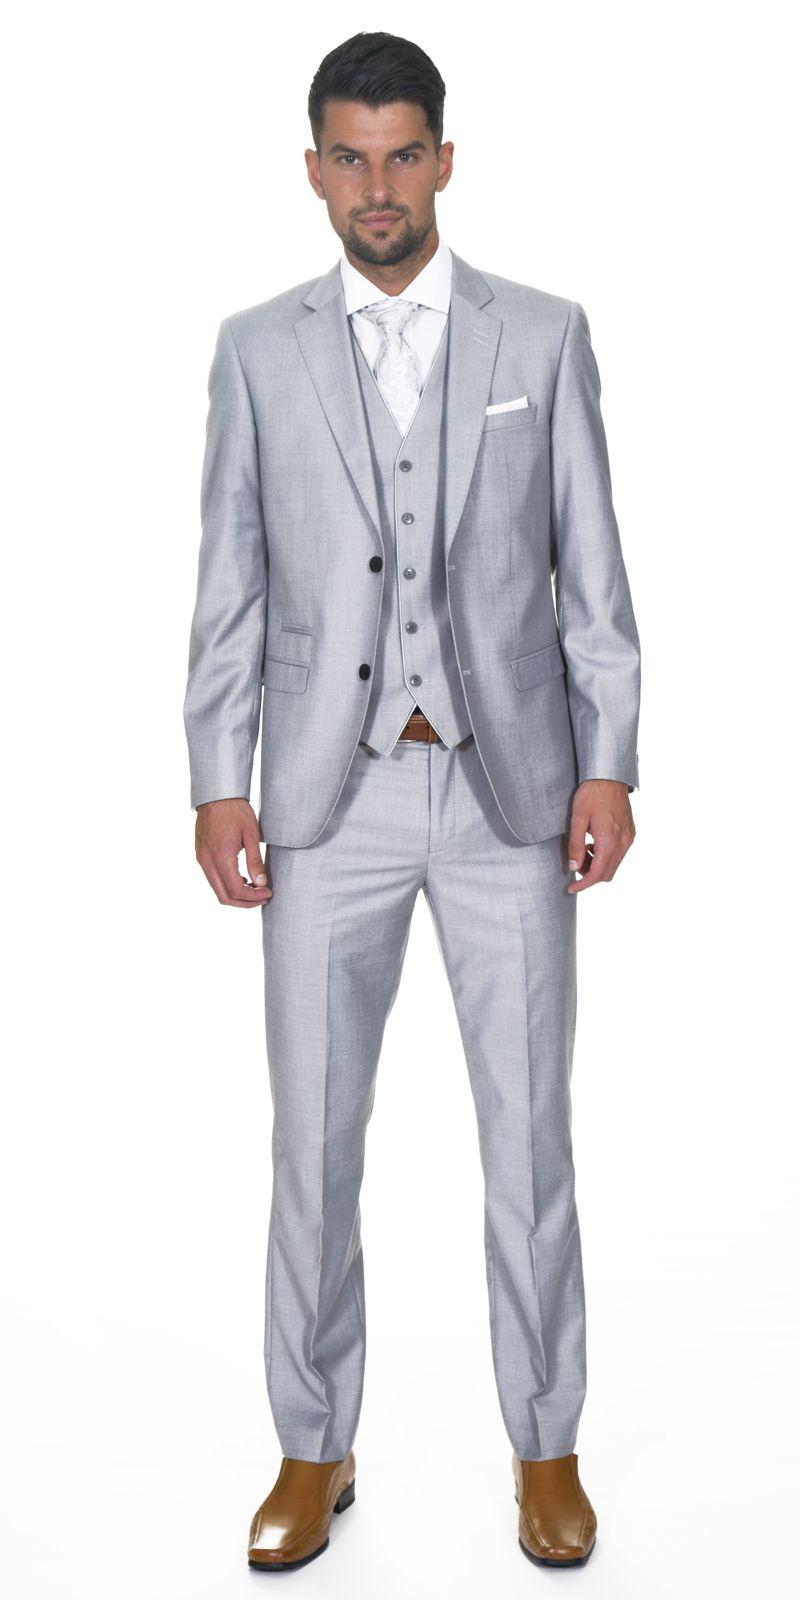 Light Grey Suit White Tie Matching Dahlia Pocket Square Brown